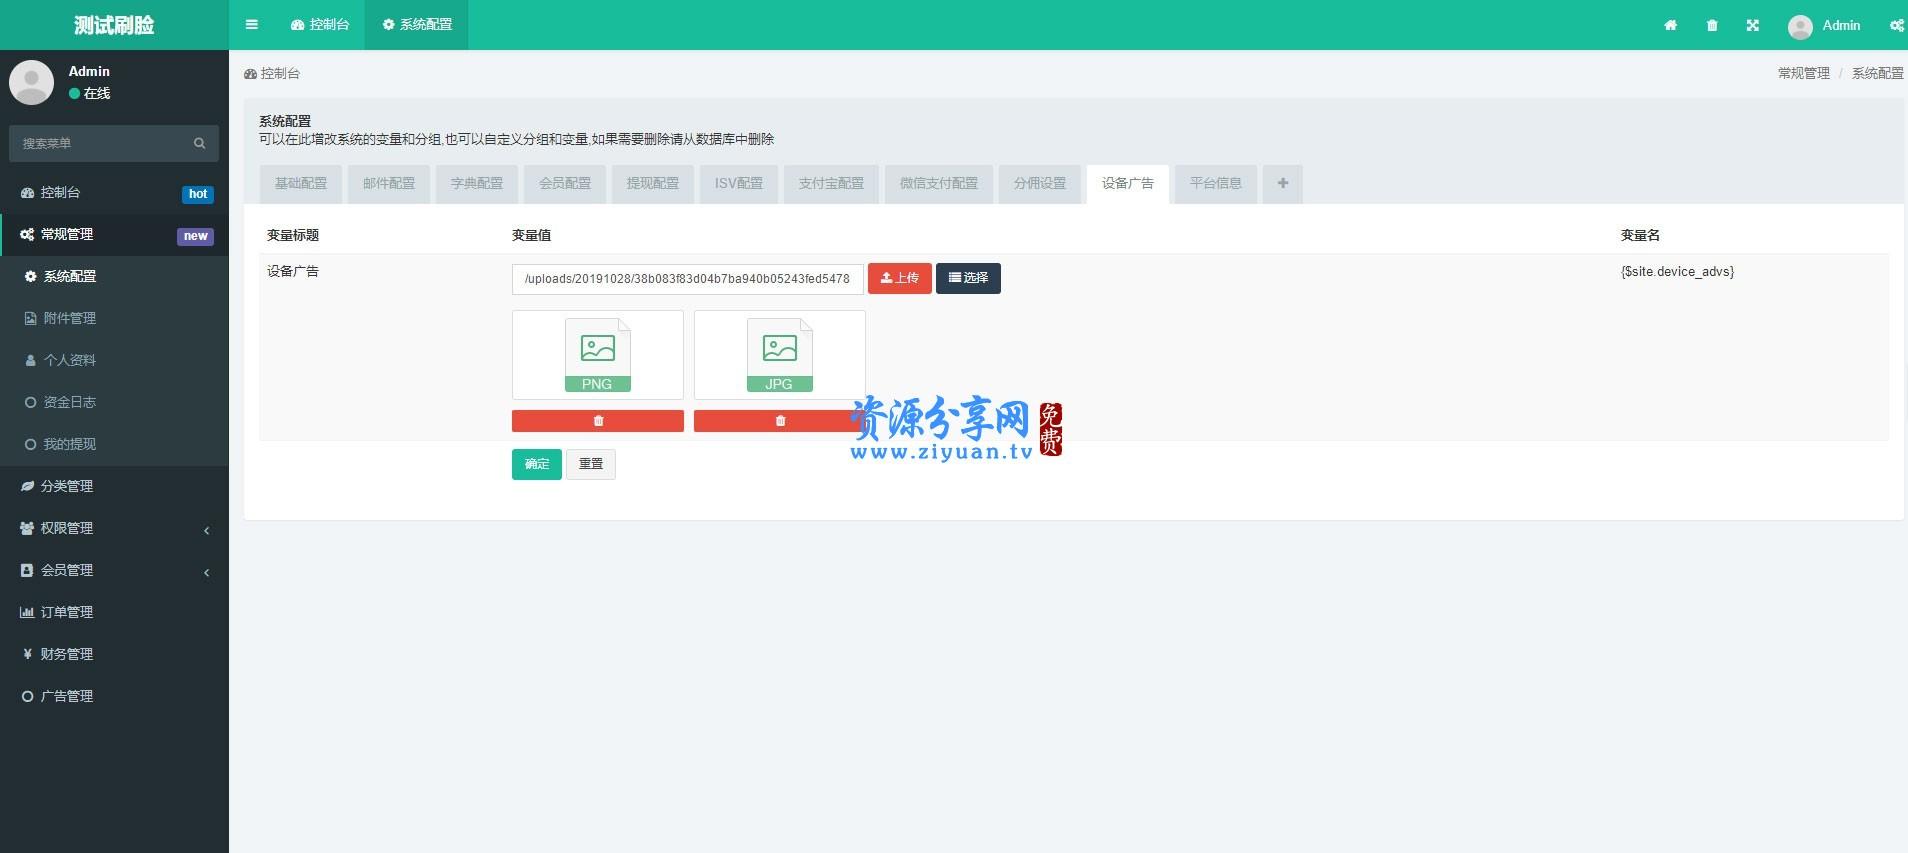 FastAdmin 开发的刷脸支付 API 接口源码